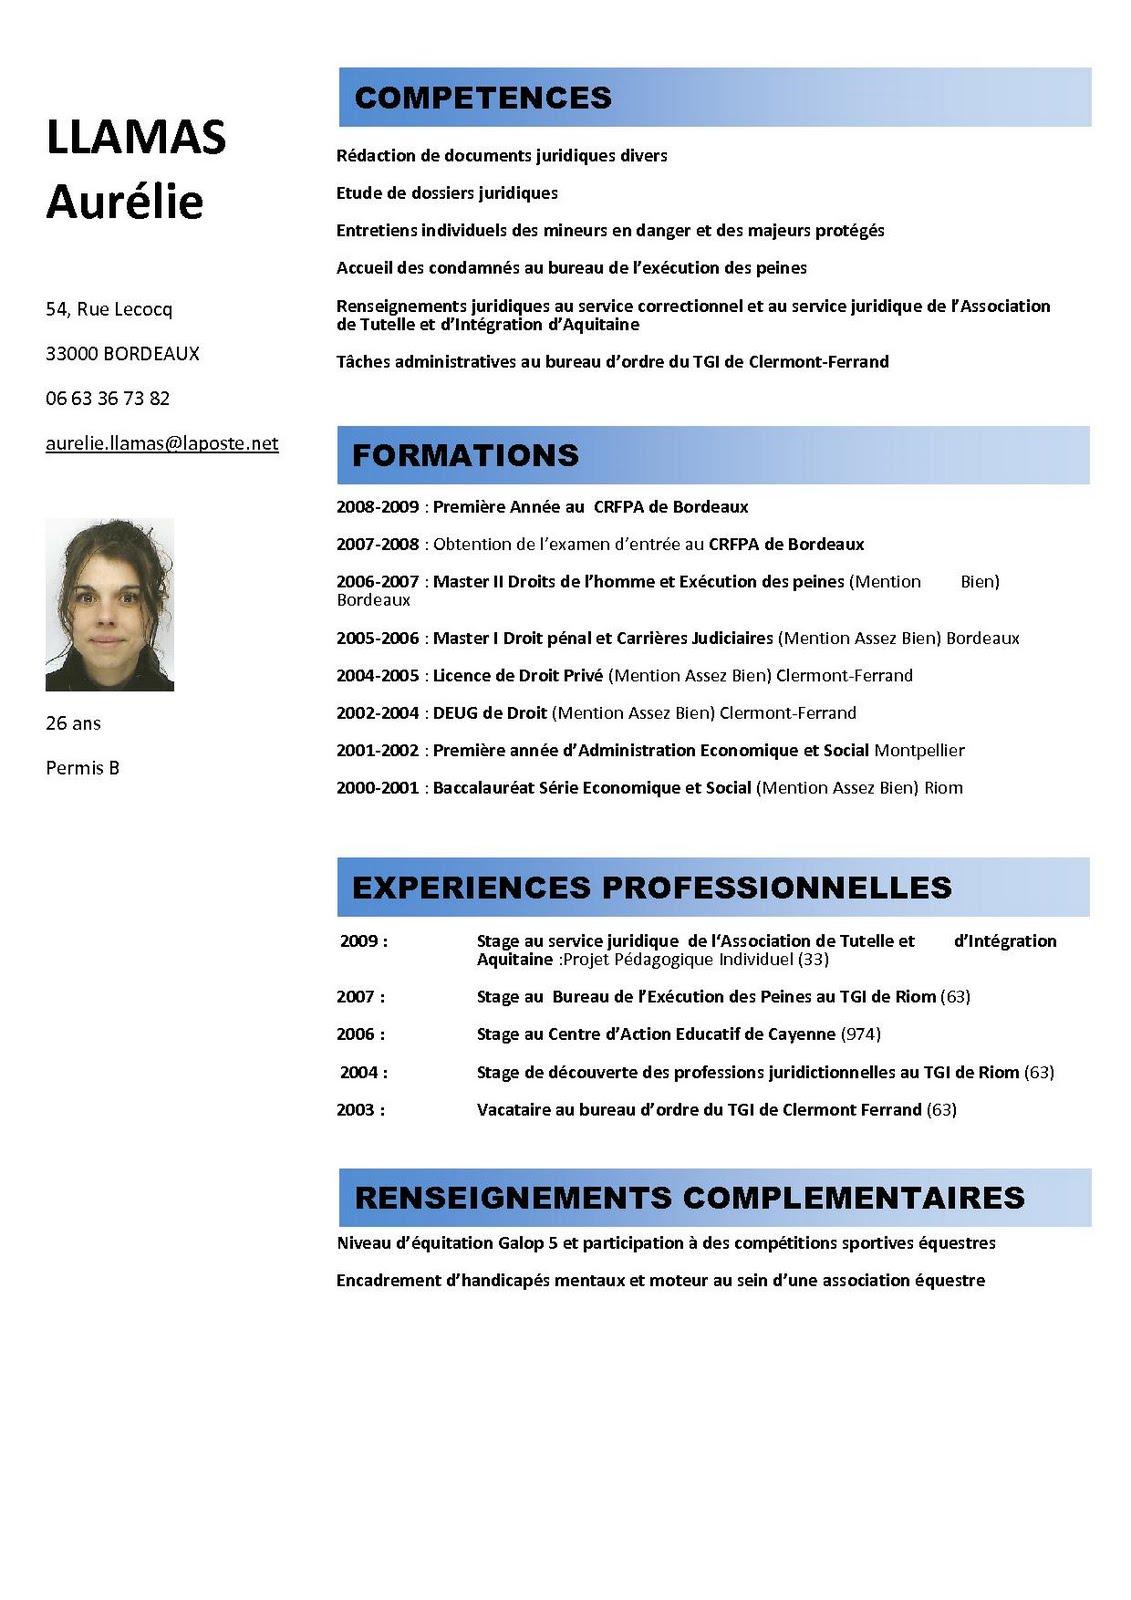 cv from pdf